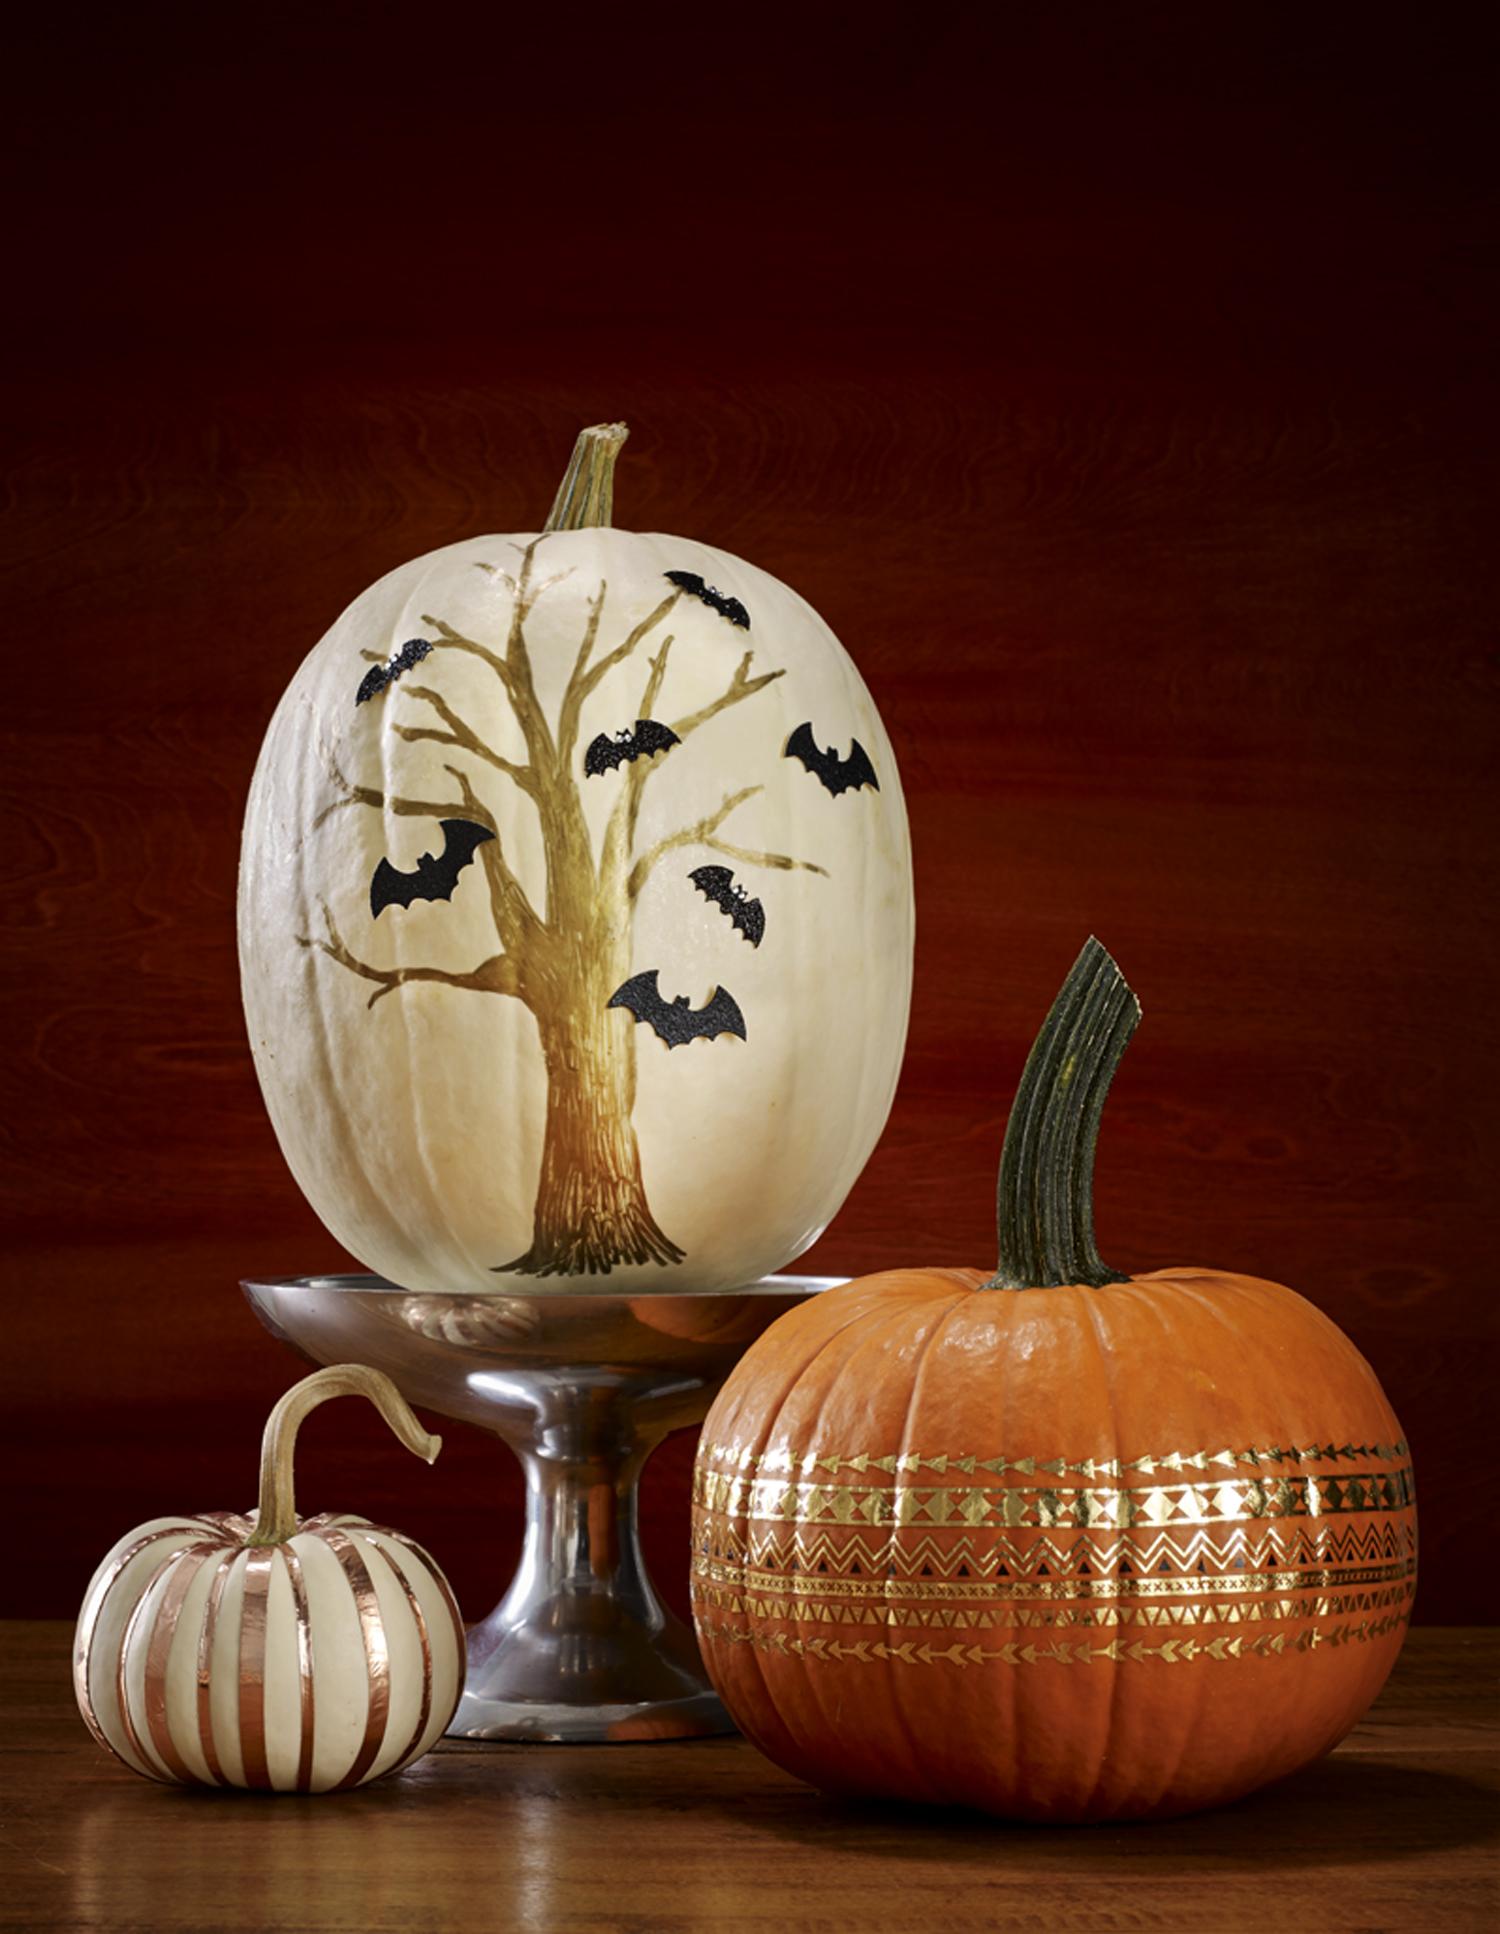 Halloween pumpkin painting ideas no carve